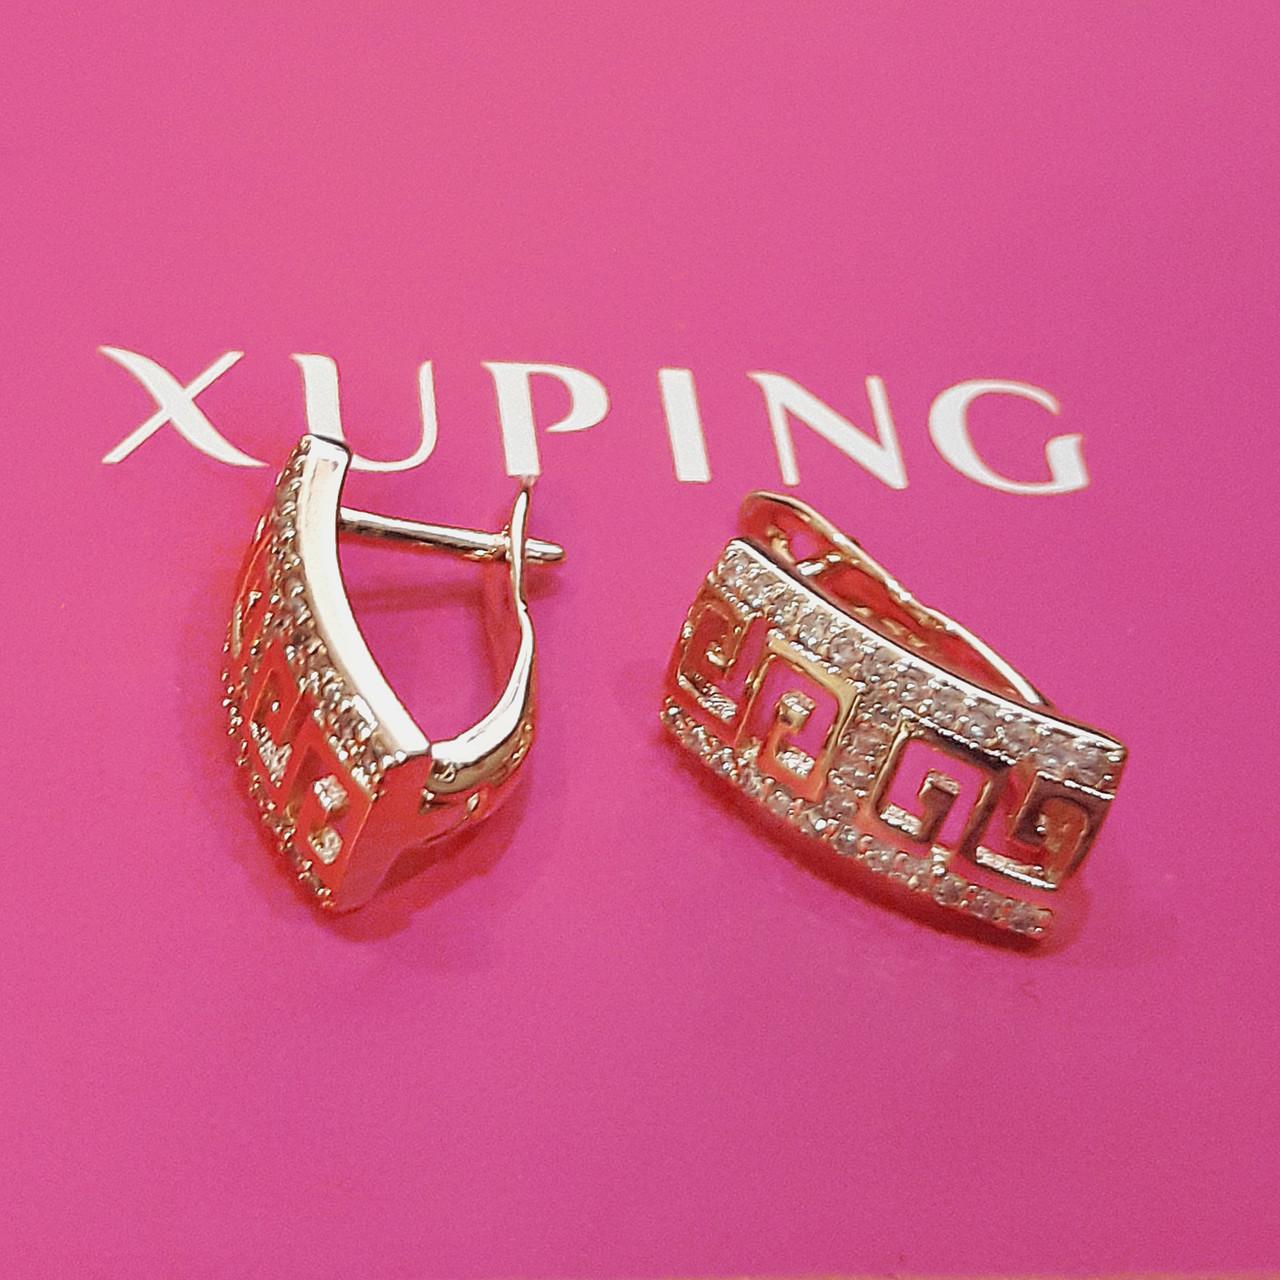 Серьги Xuping позолота 18К длина 1.5см ширина 6мм с1094